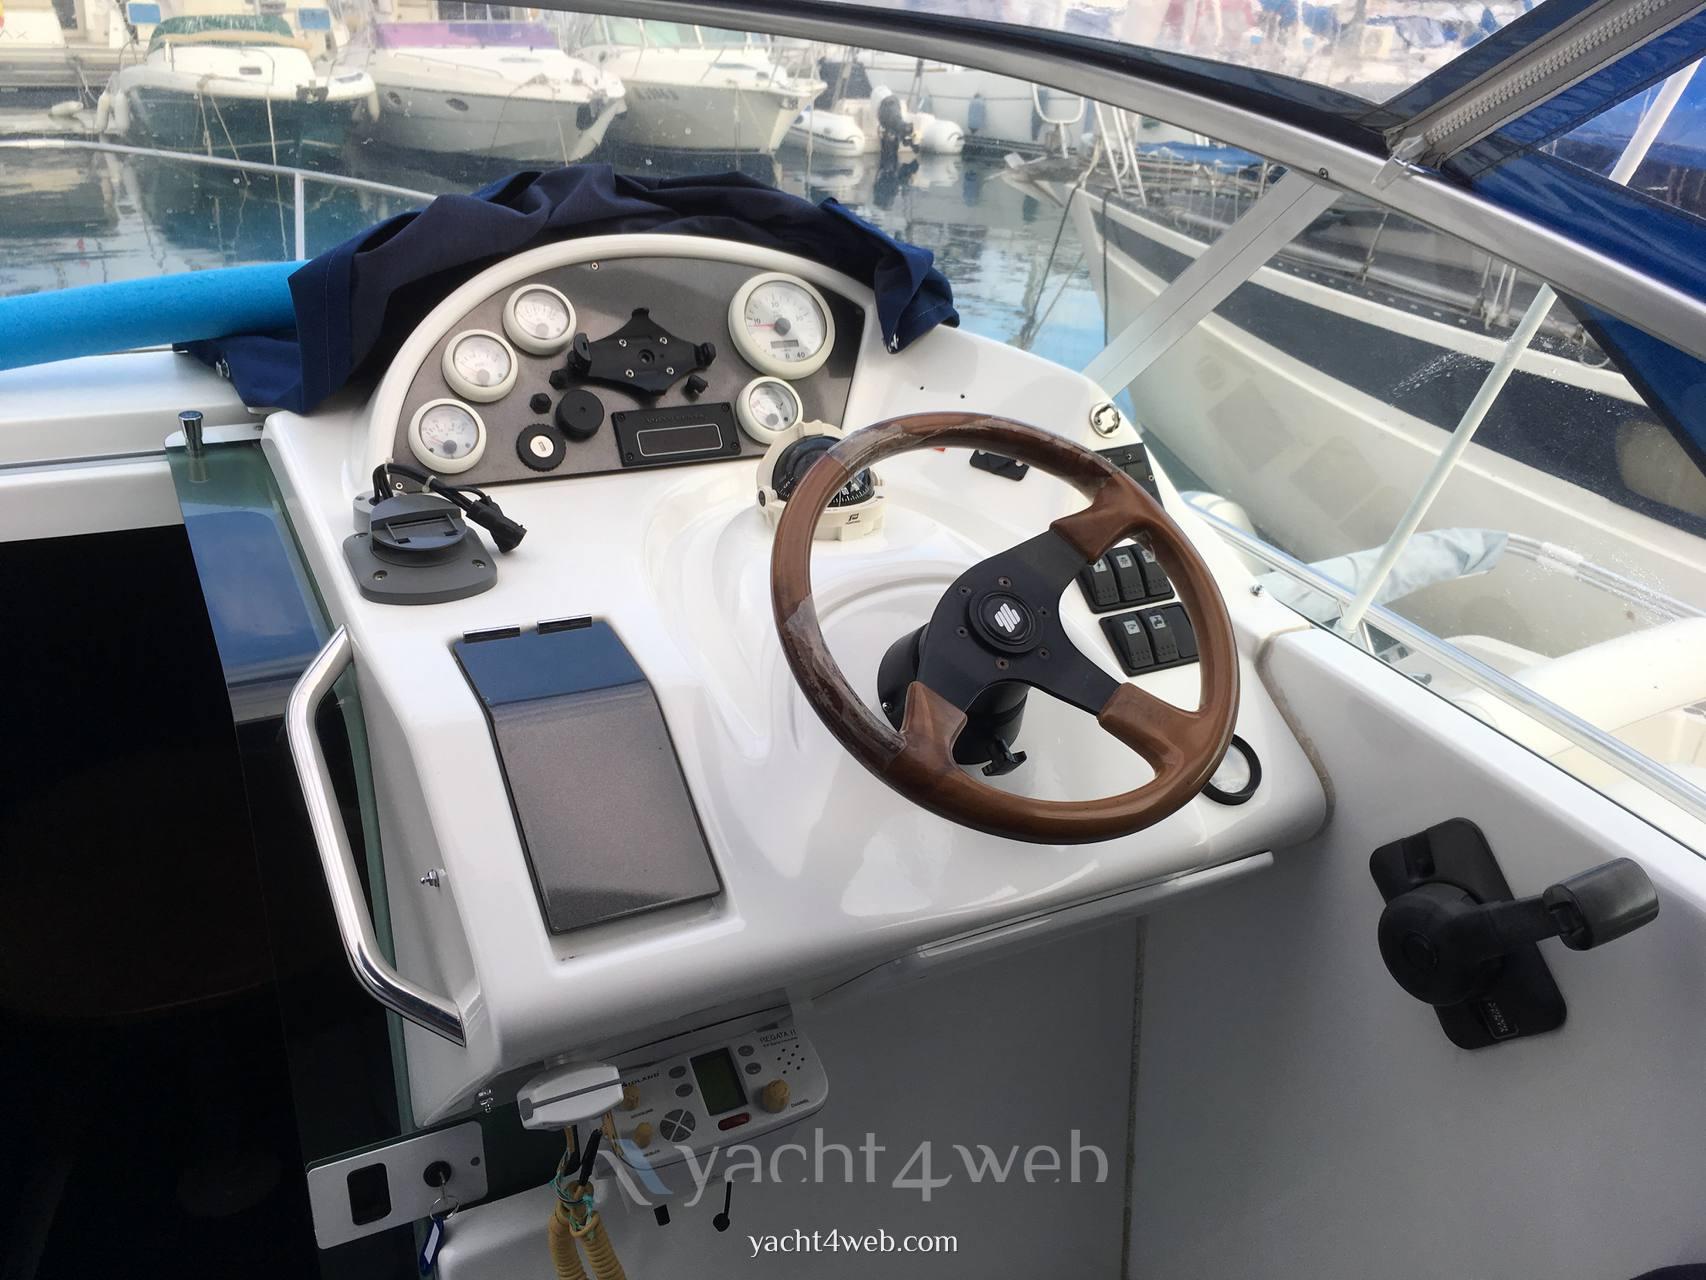 BENETEAU Flyer 701 Motor boat used for sale